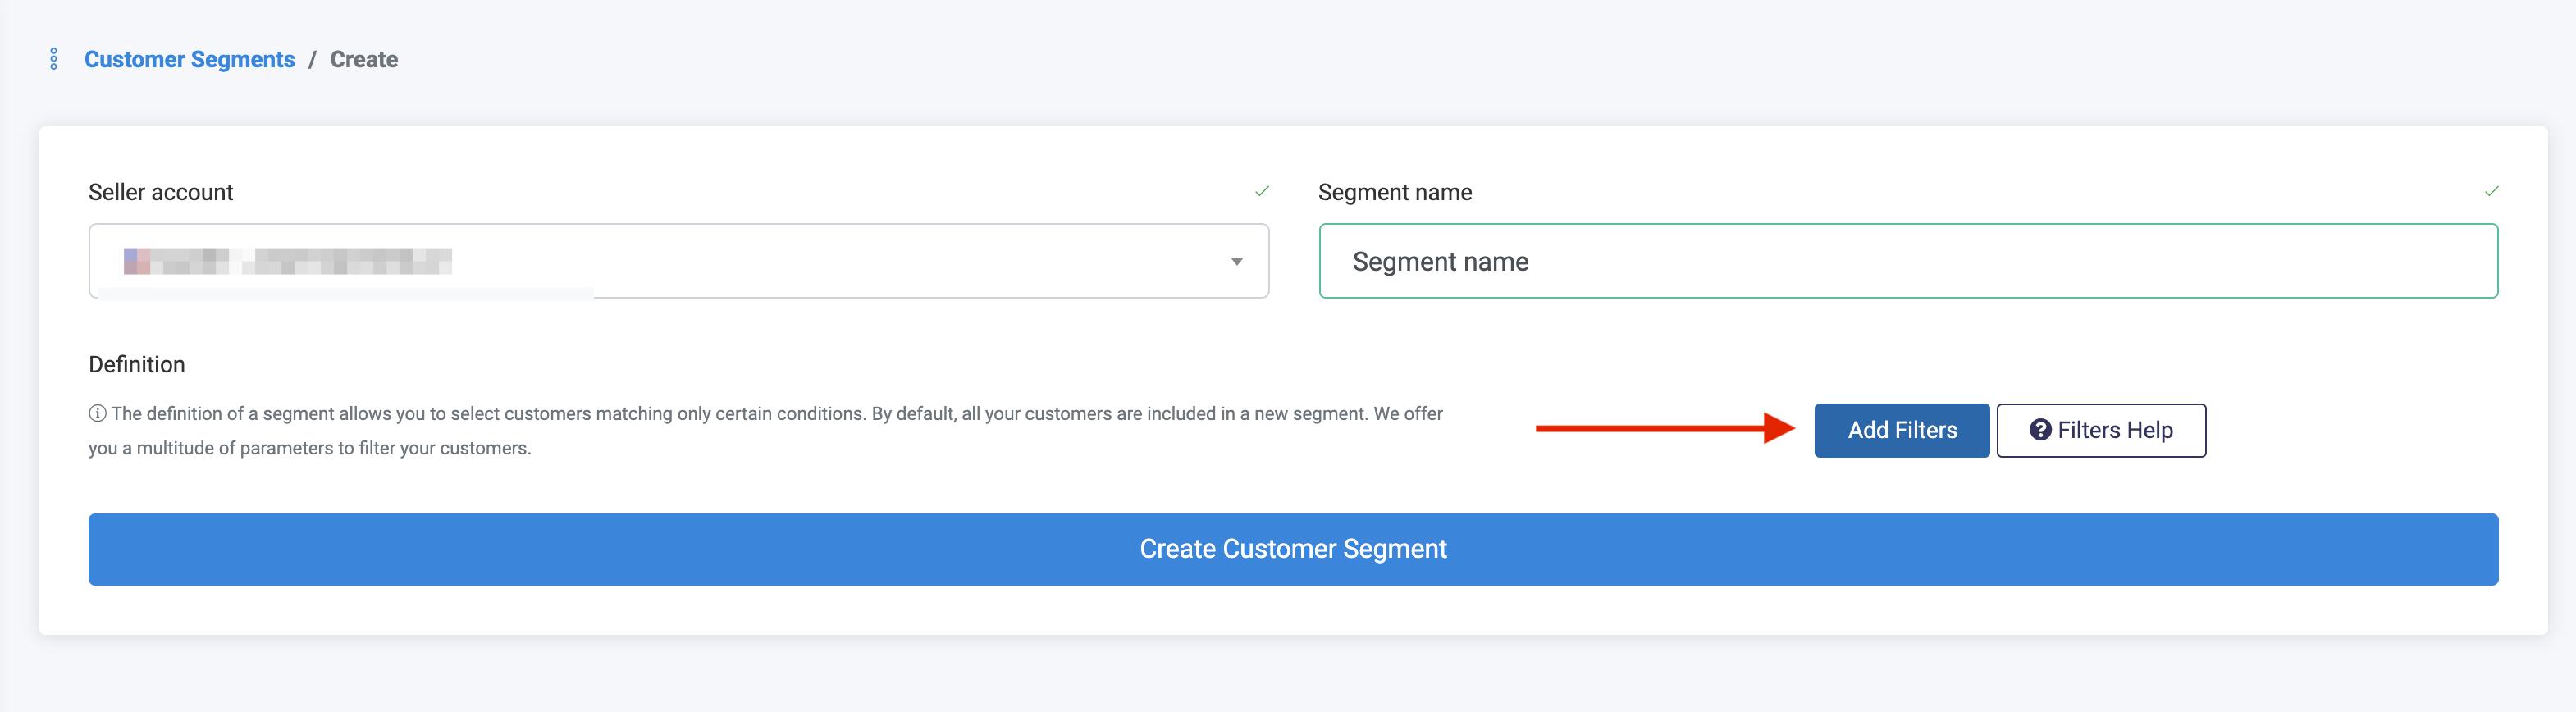 Customer Segments SOP-Create